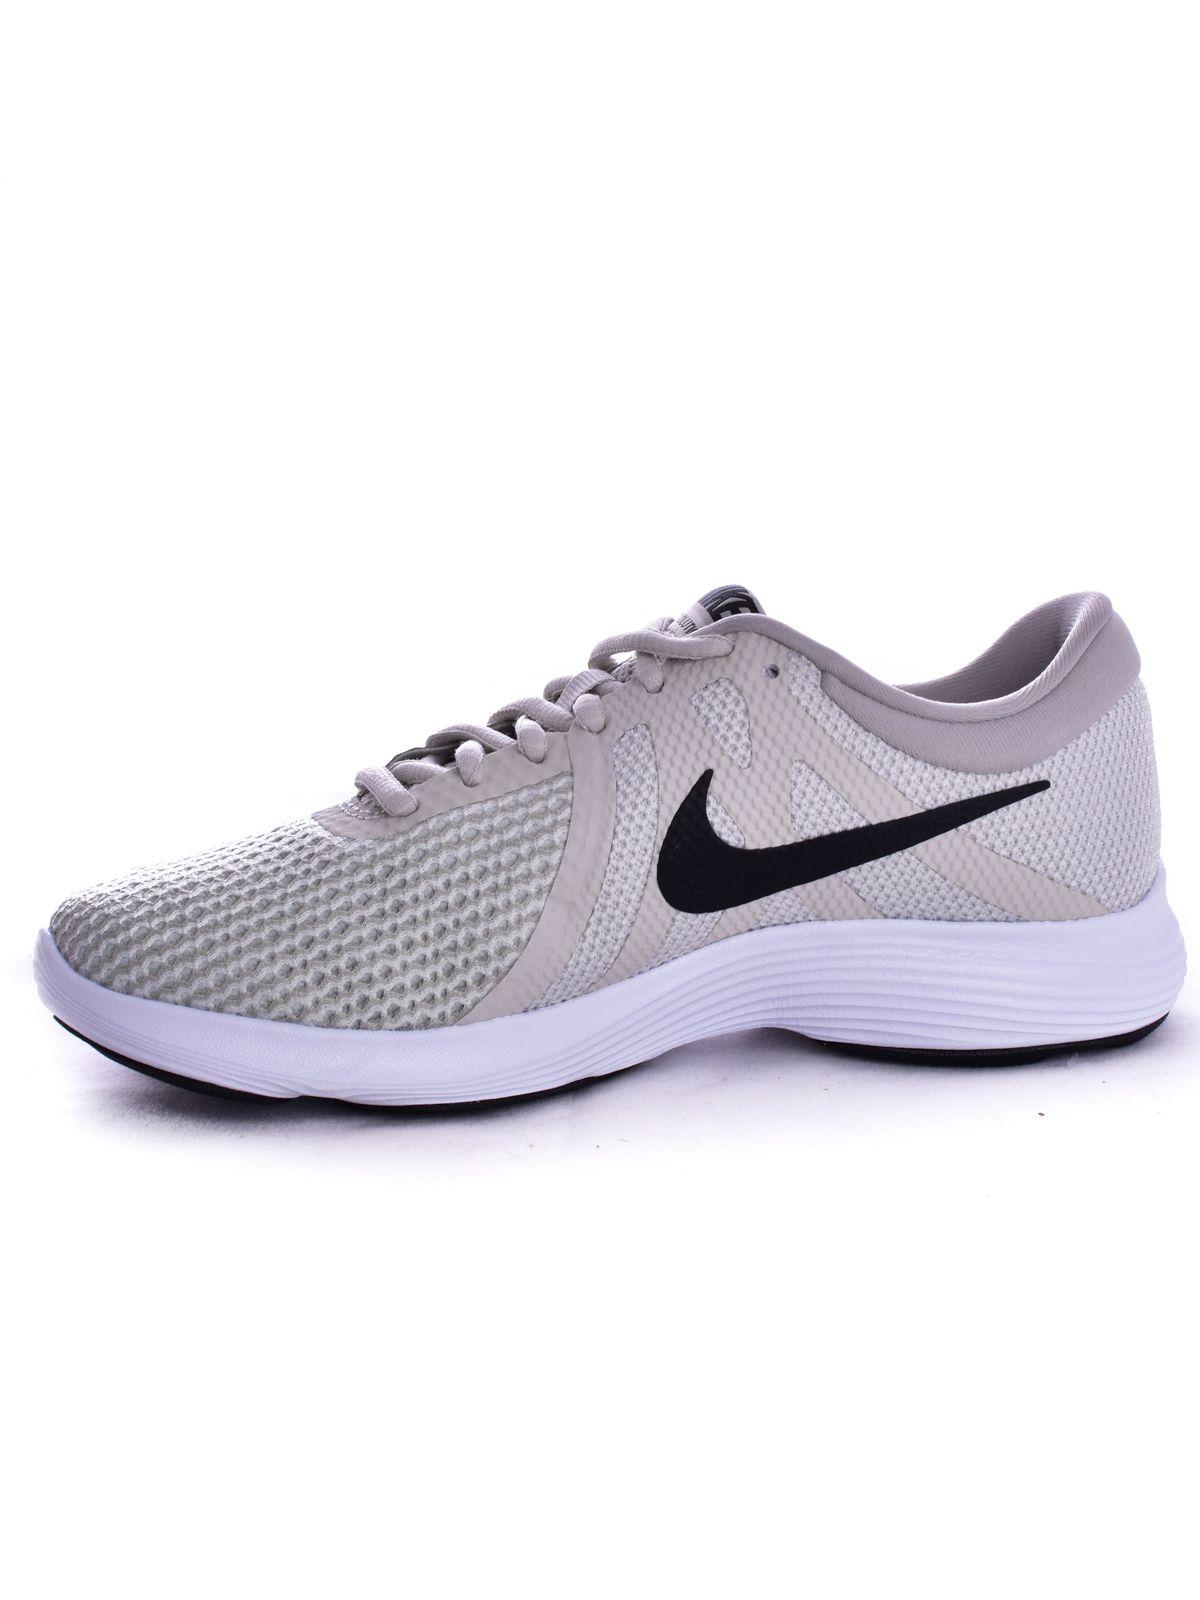 ... Nike női cipő Revolution 4 Running Shoe (EU) ... 39772959fb